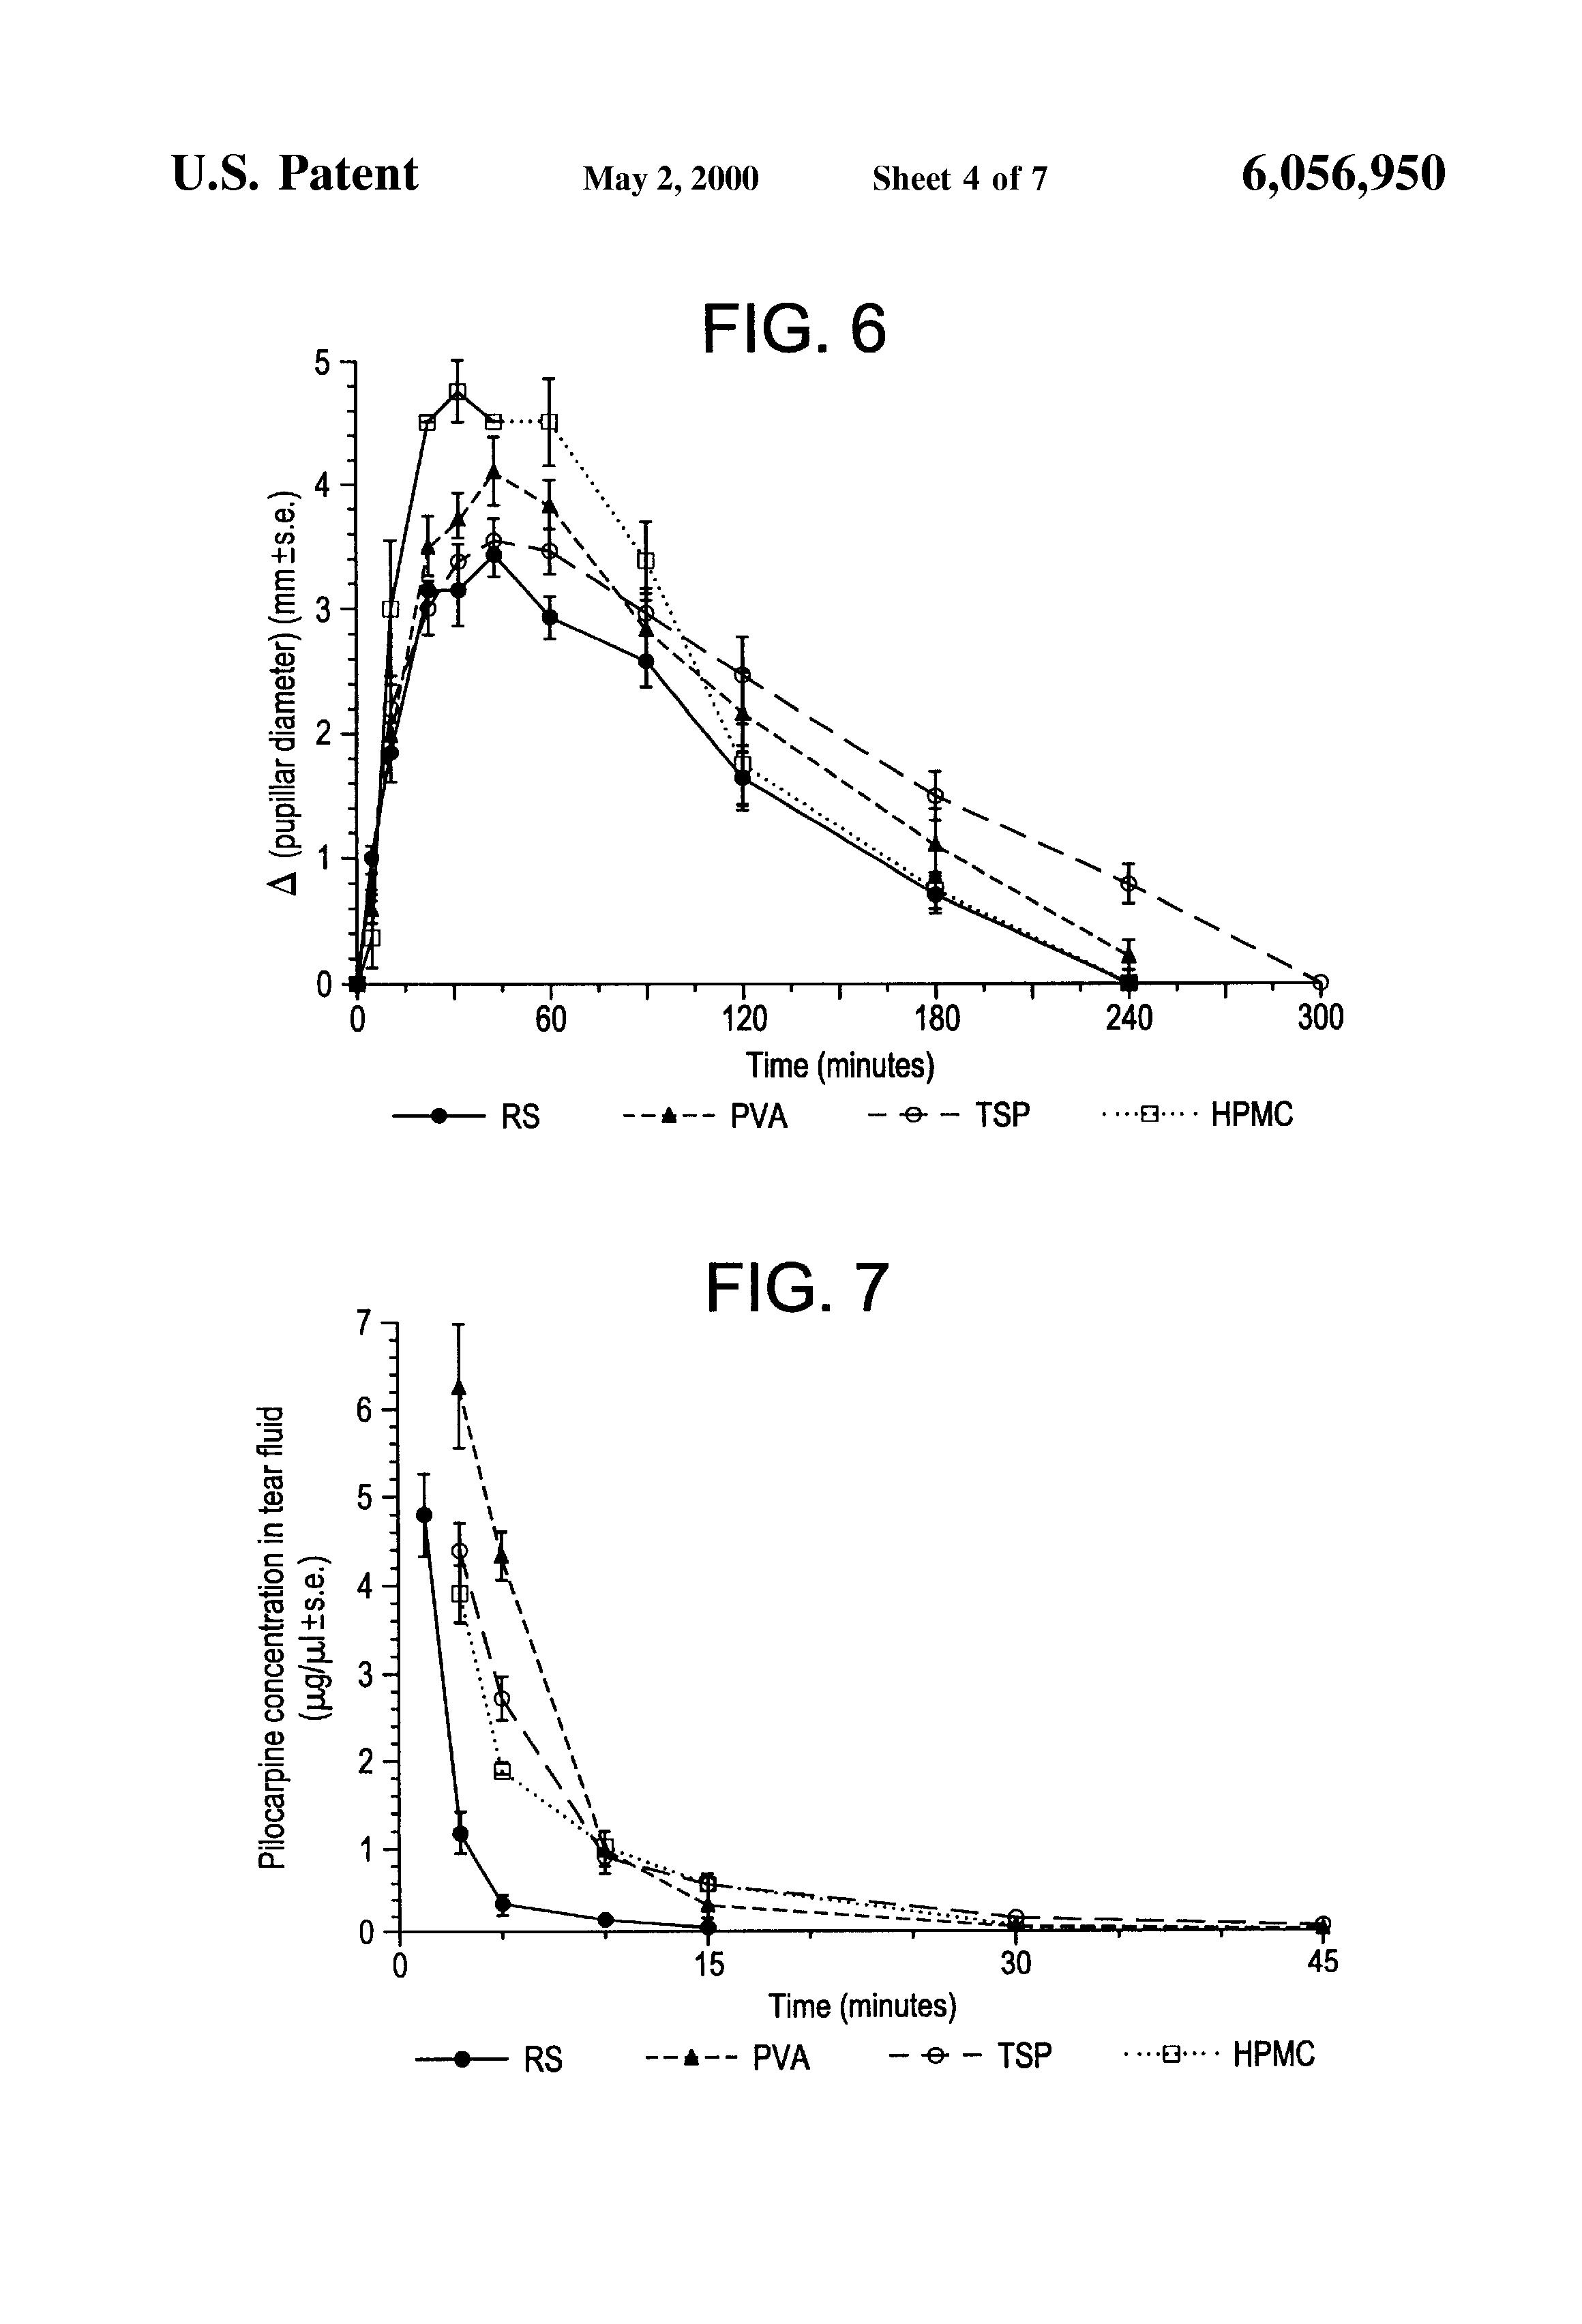 adverse side-effects of amitriptyline